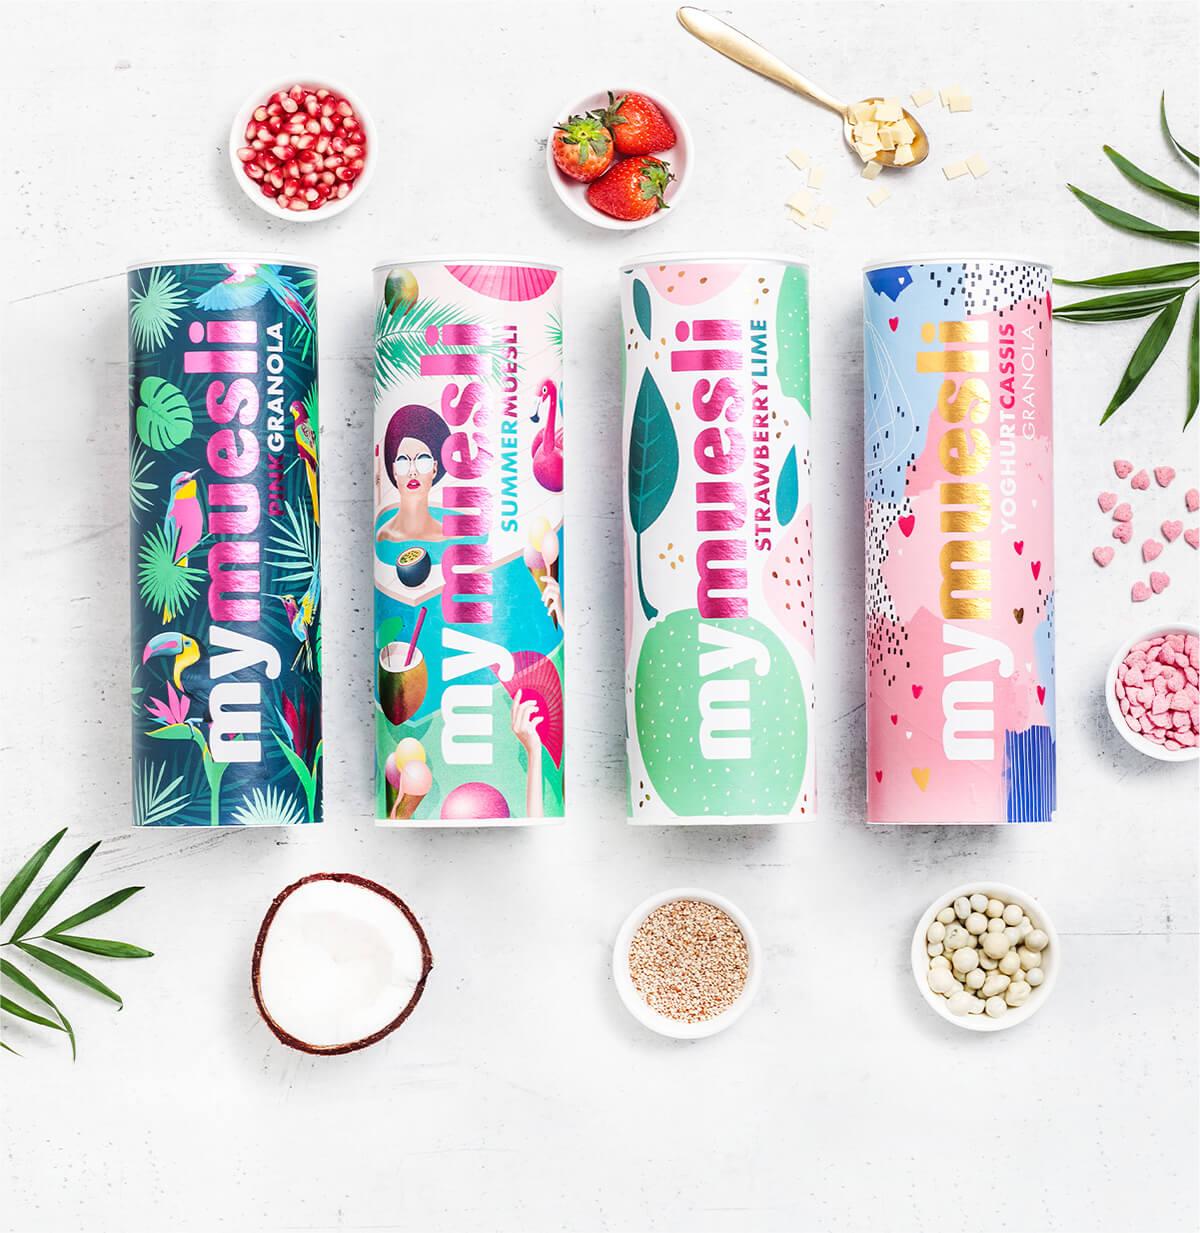 teaser-pink-summer-paket05.jpg